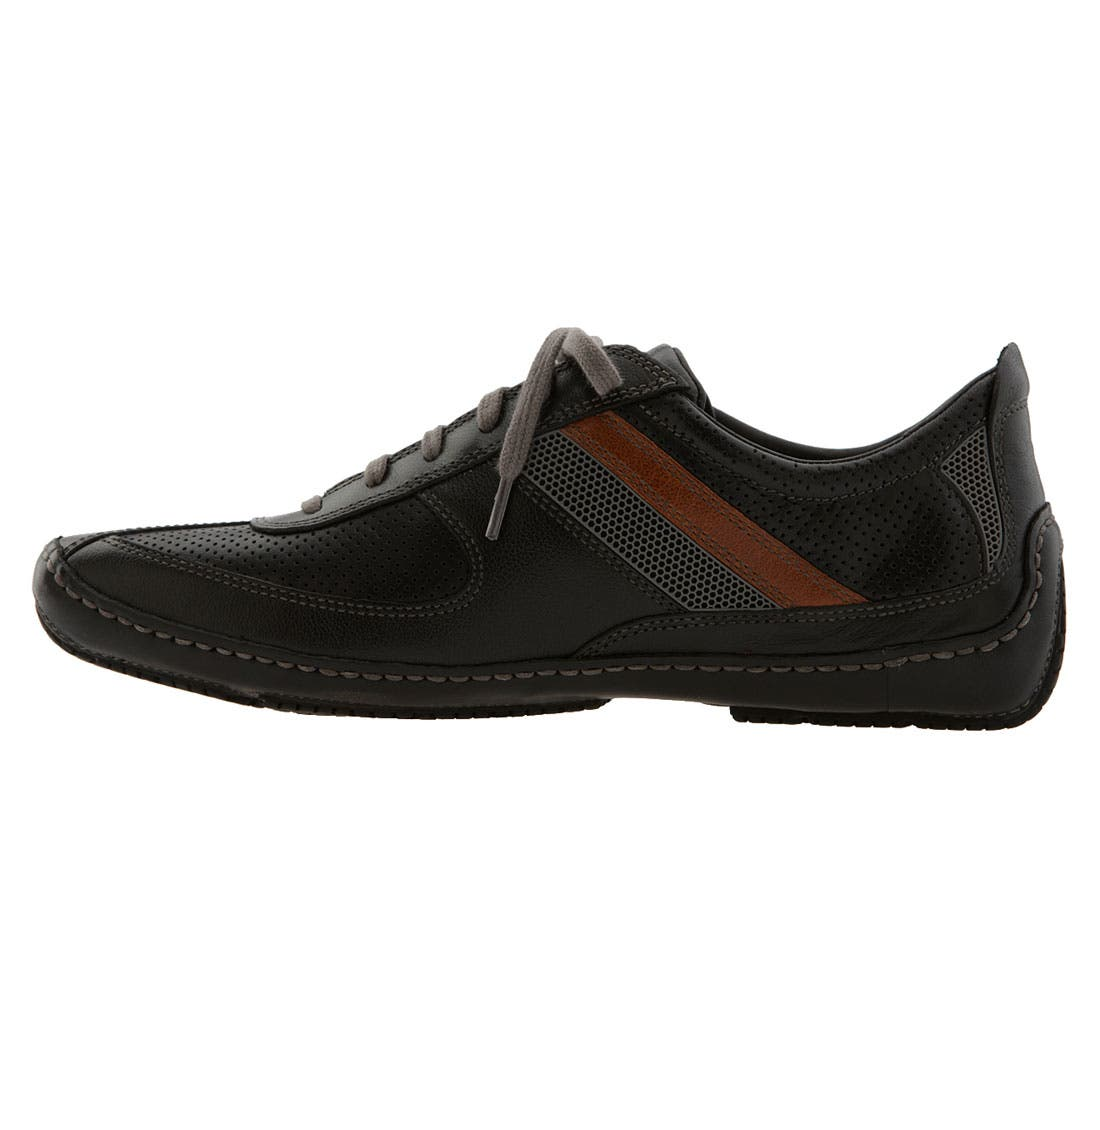 a33f48ef3a5 All Men s Cole Haan Shoes  Sale